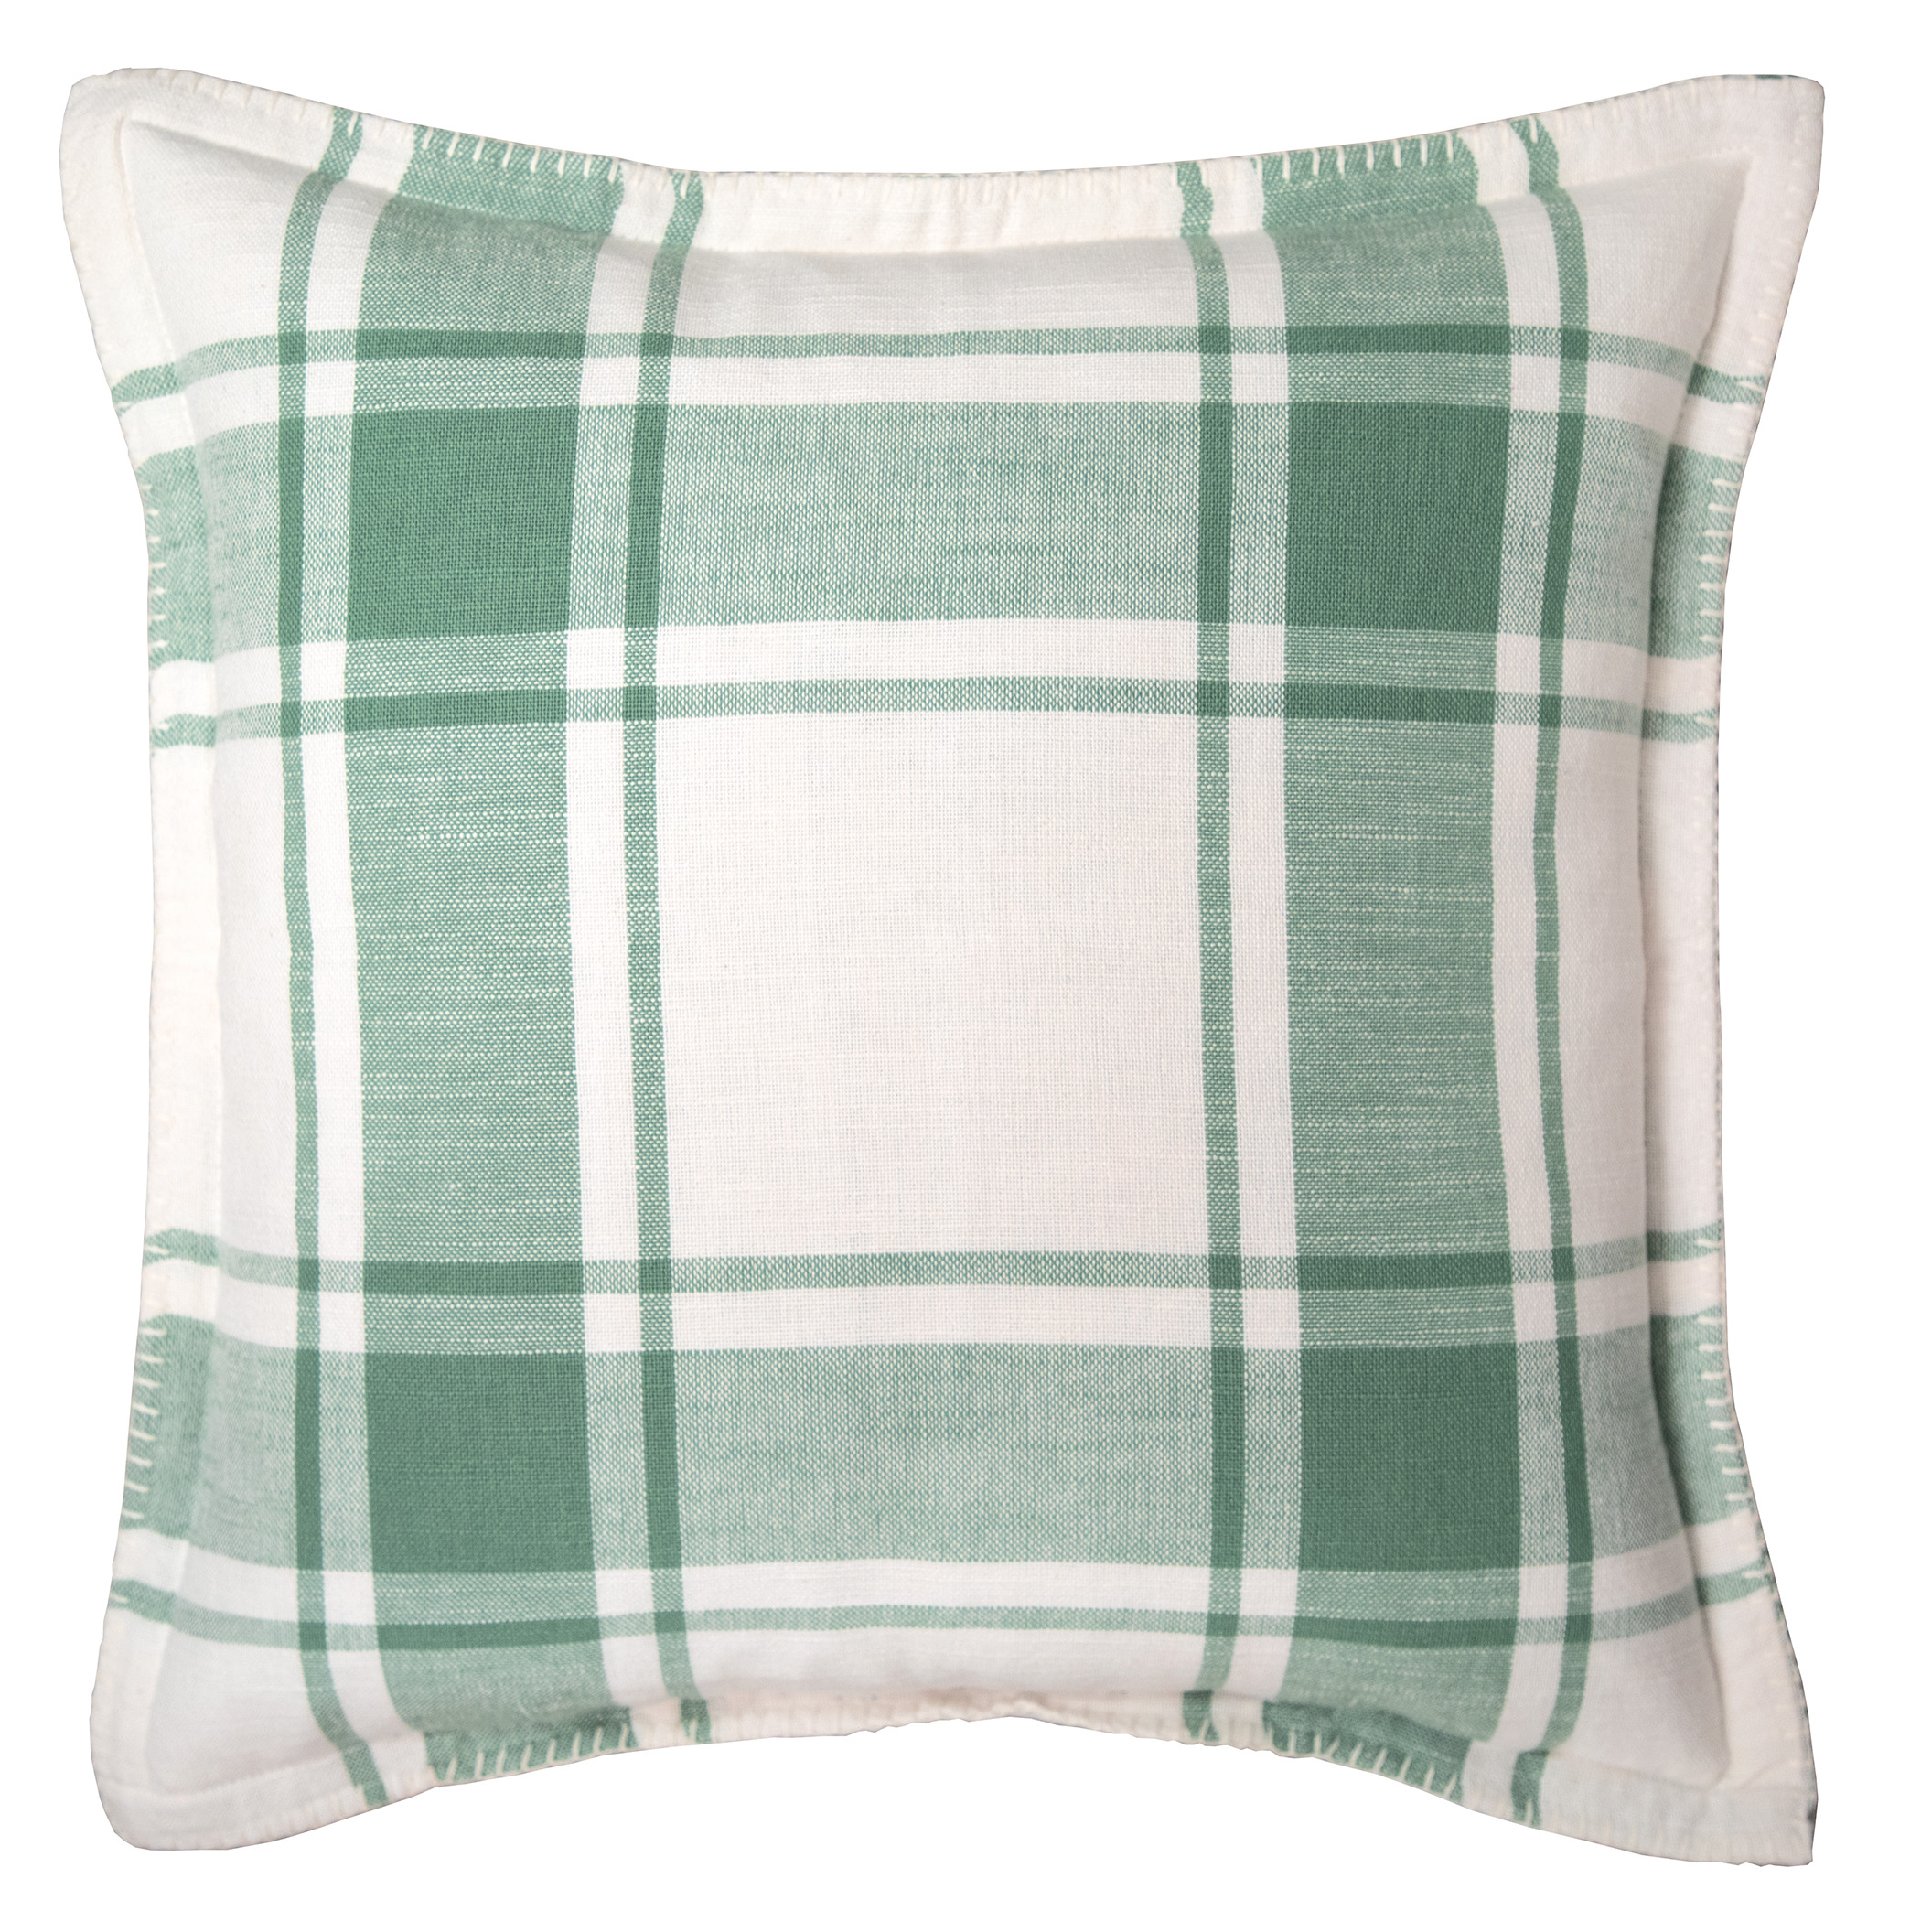 better homes gardens reversible plaid decorative pillow 20 x 20 green sage walmart com